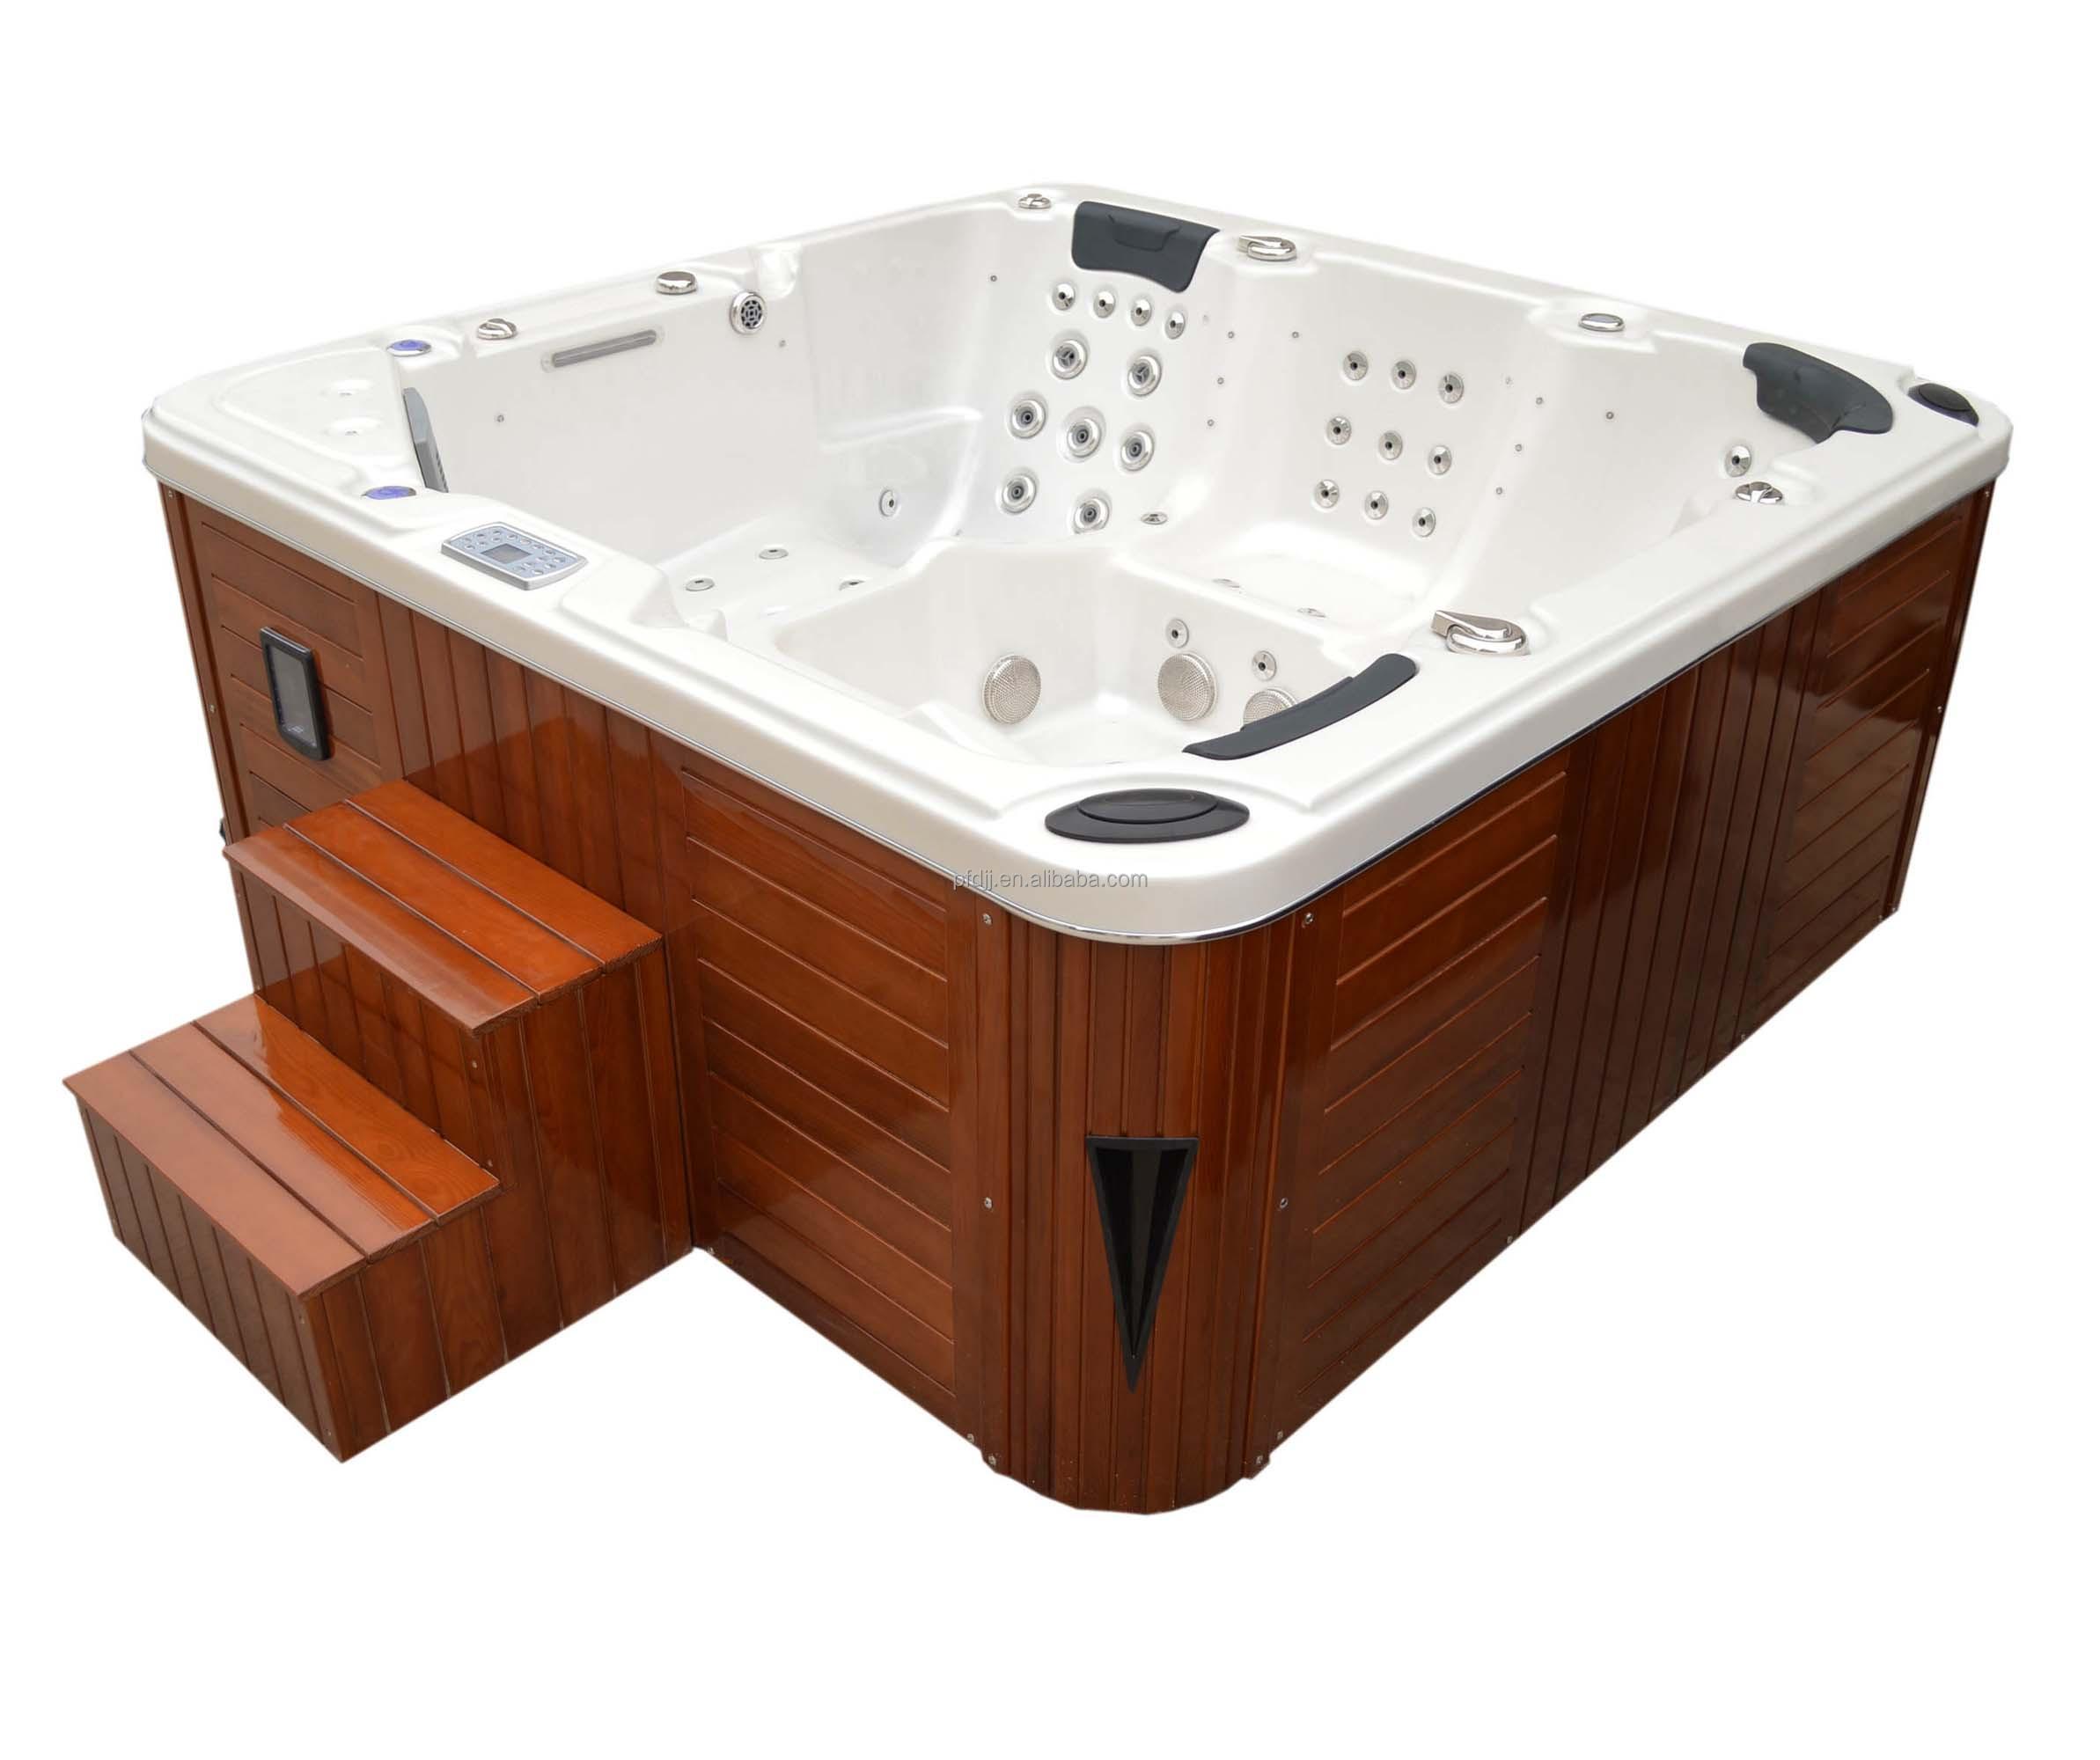 fabrik lieferant acryl 5 personen hydromassage badewanne, acryl, Gartengerate ideen